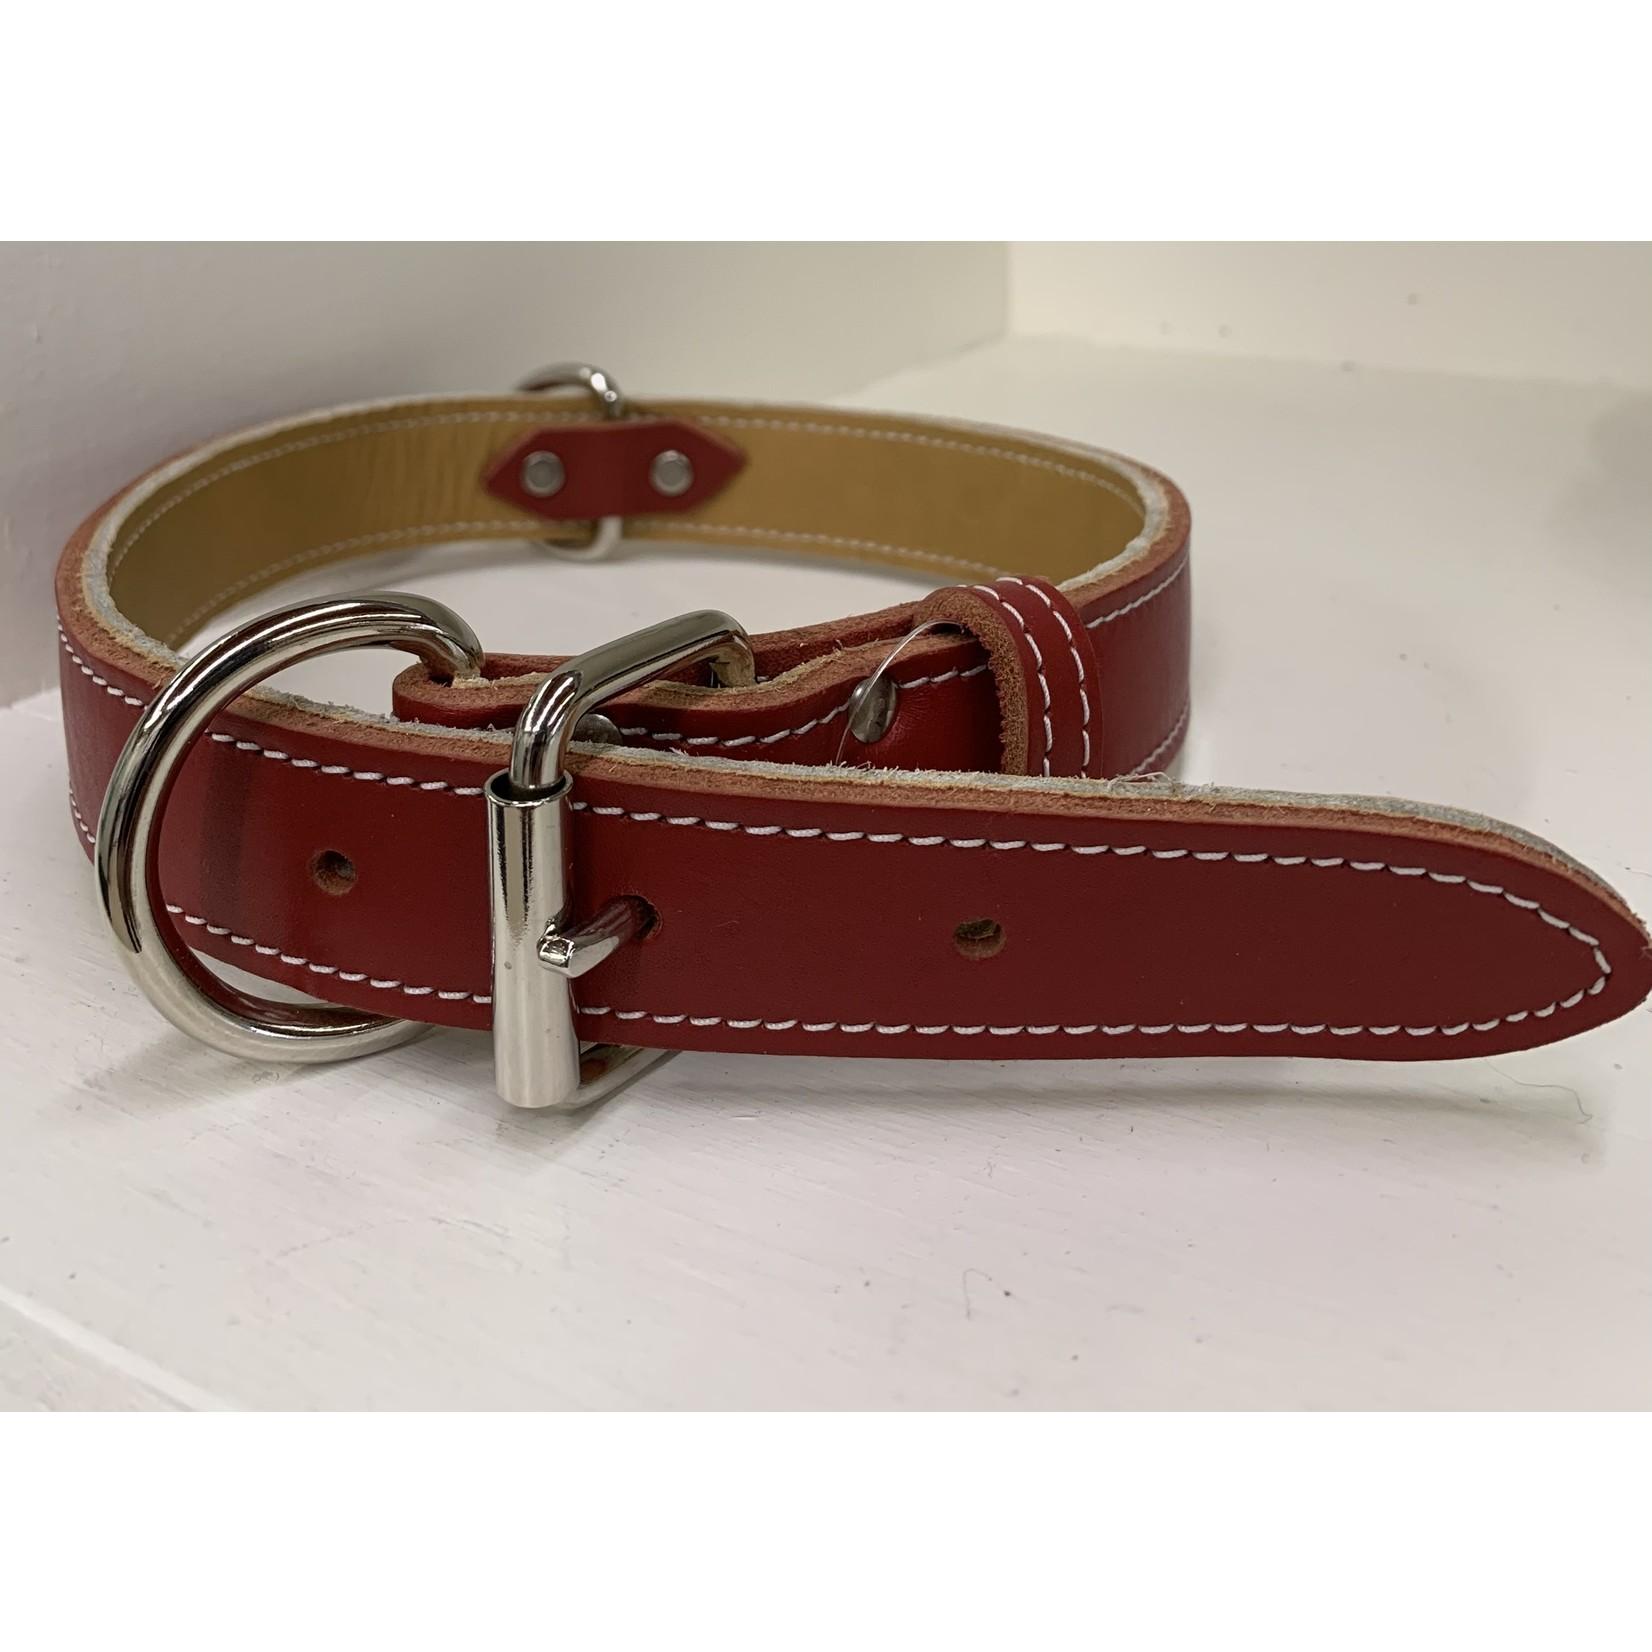 leather collar brick 1/2 x 12in